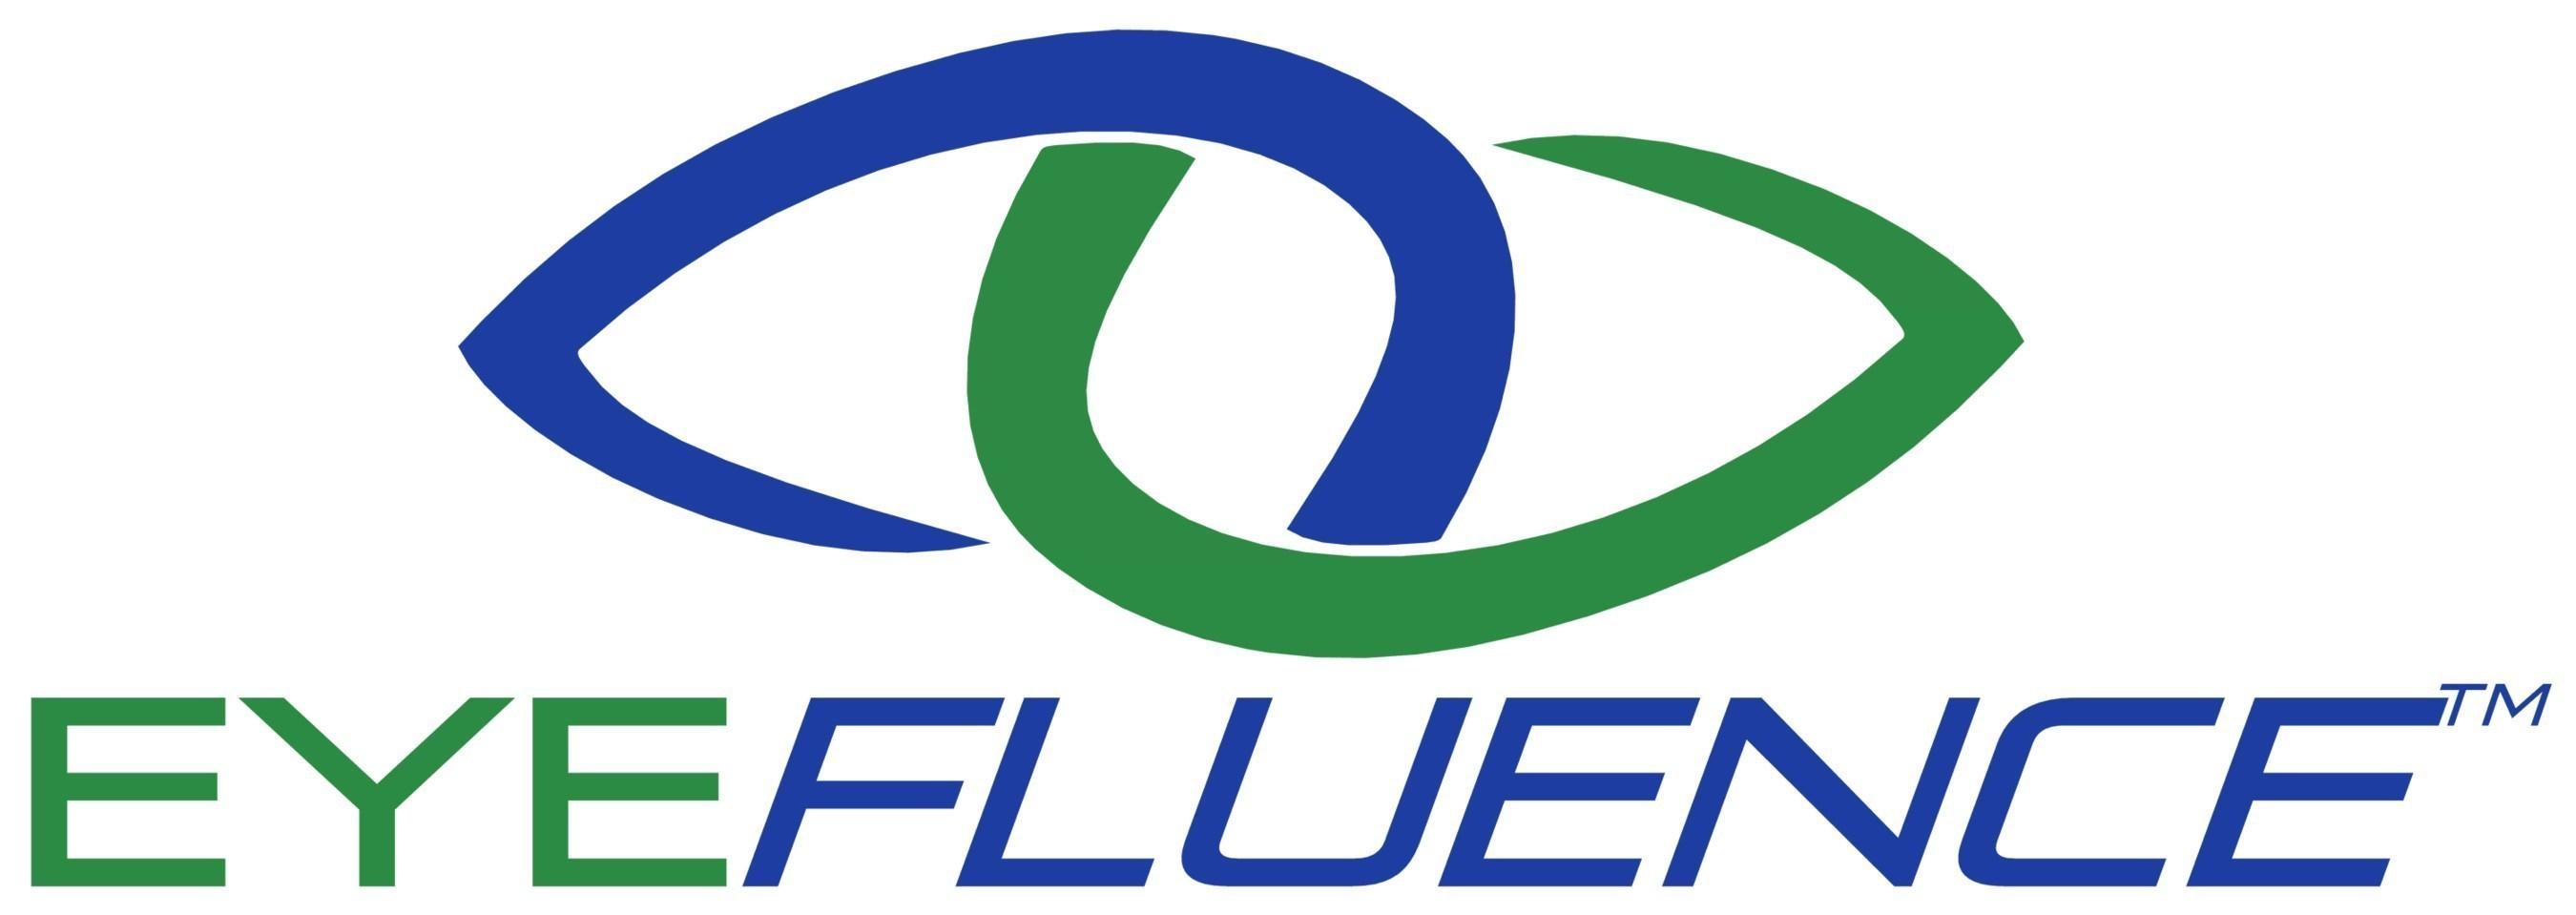 Eye-Interaction Pioneer Eyefluence Announces Company Launch, Series B Funding